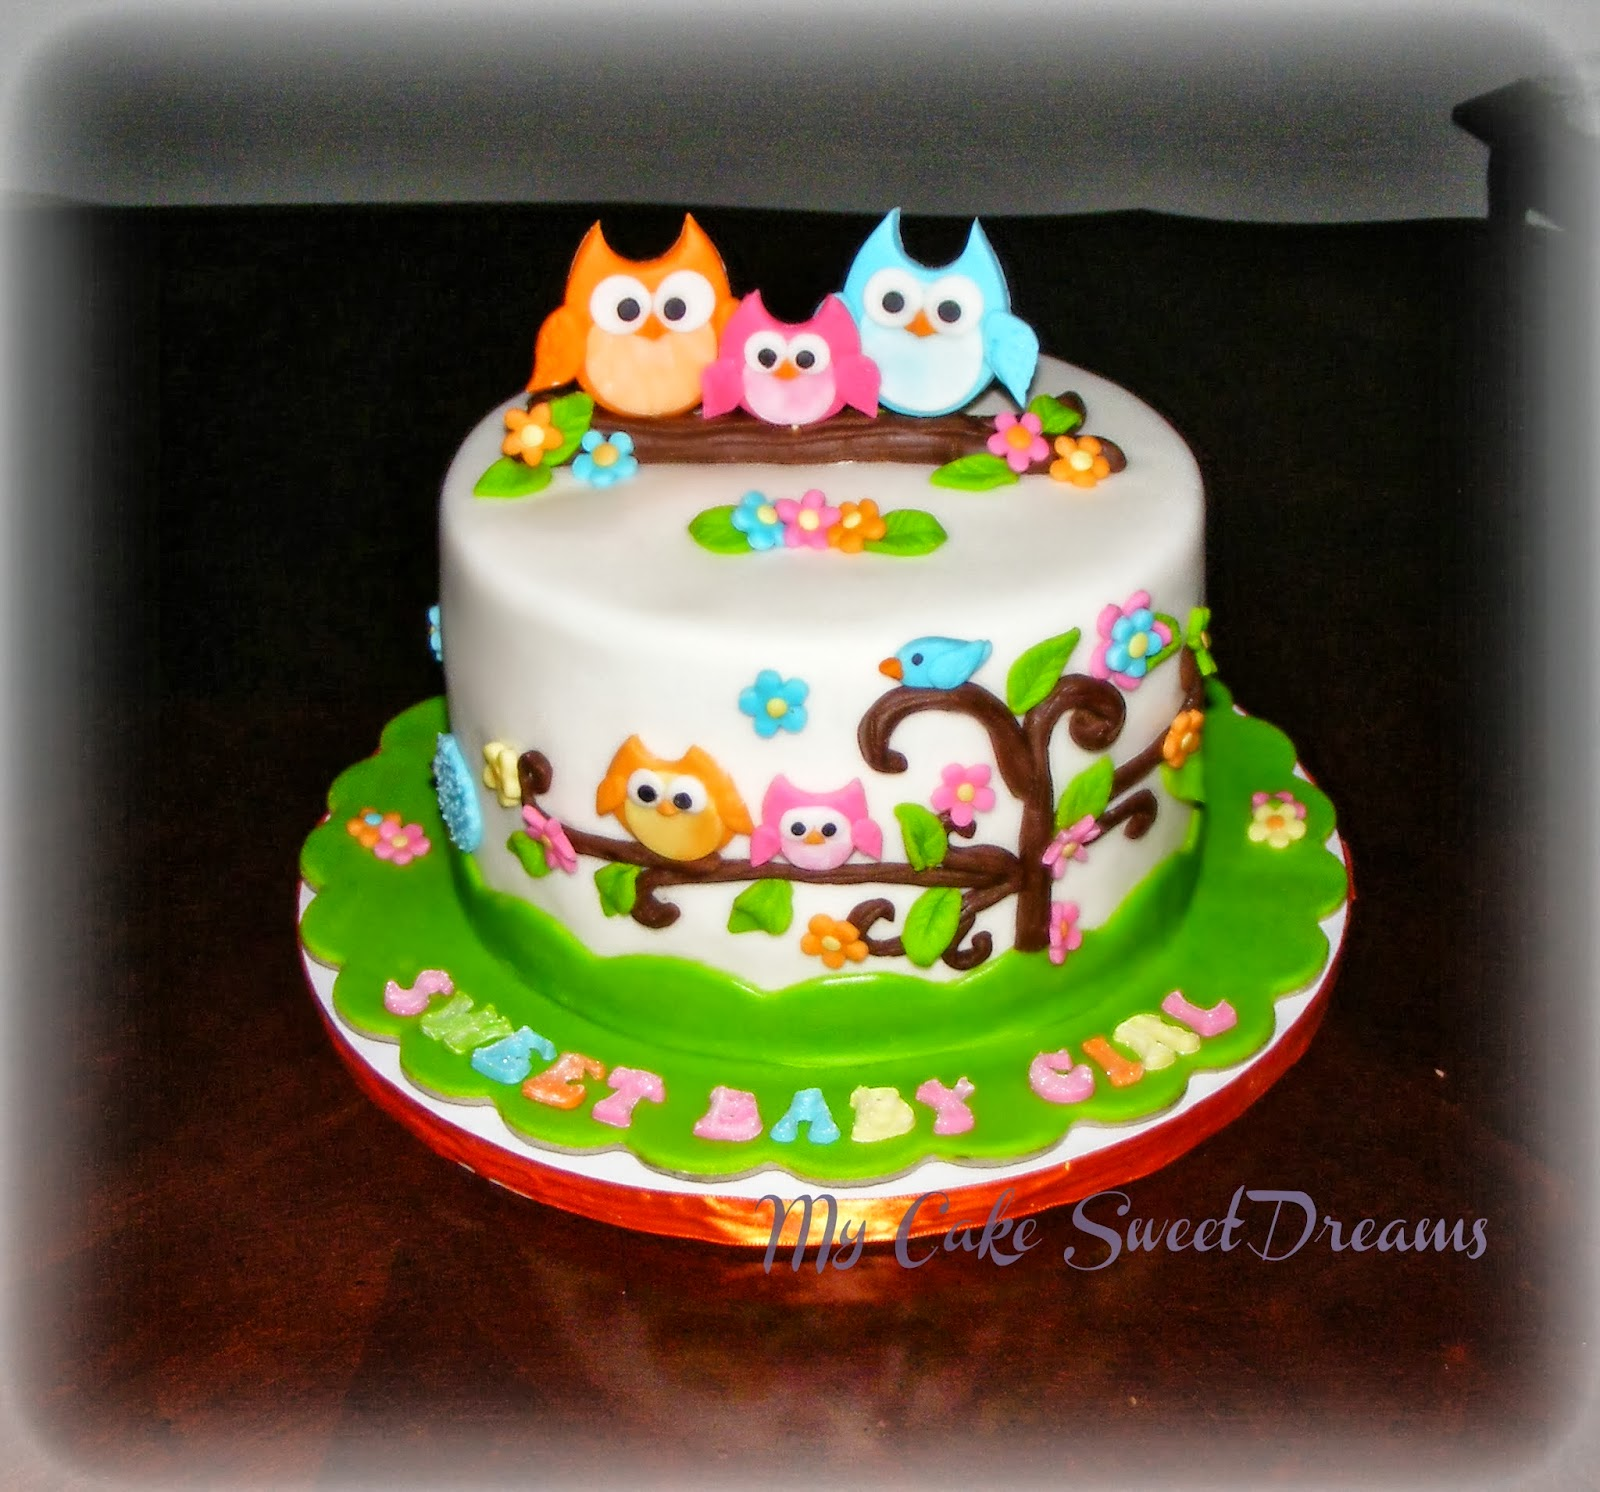 My Cake Sweet Dreams Happy Tree Baby Shower Cake Amp Cupcakes